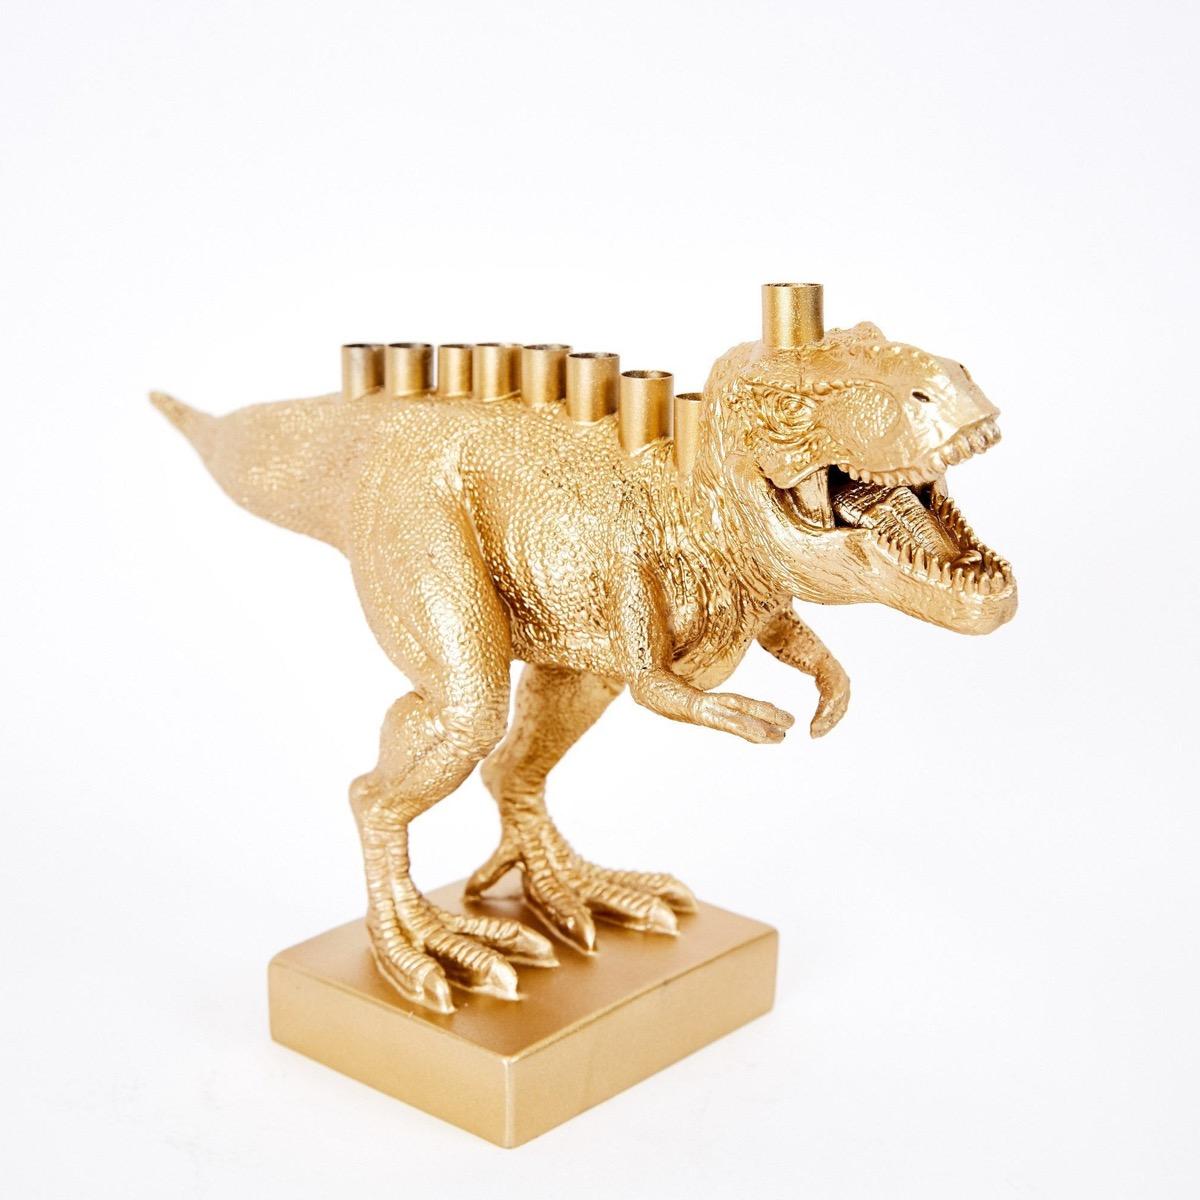 gold dinosaur menorah, hanukkah decorations